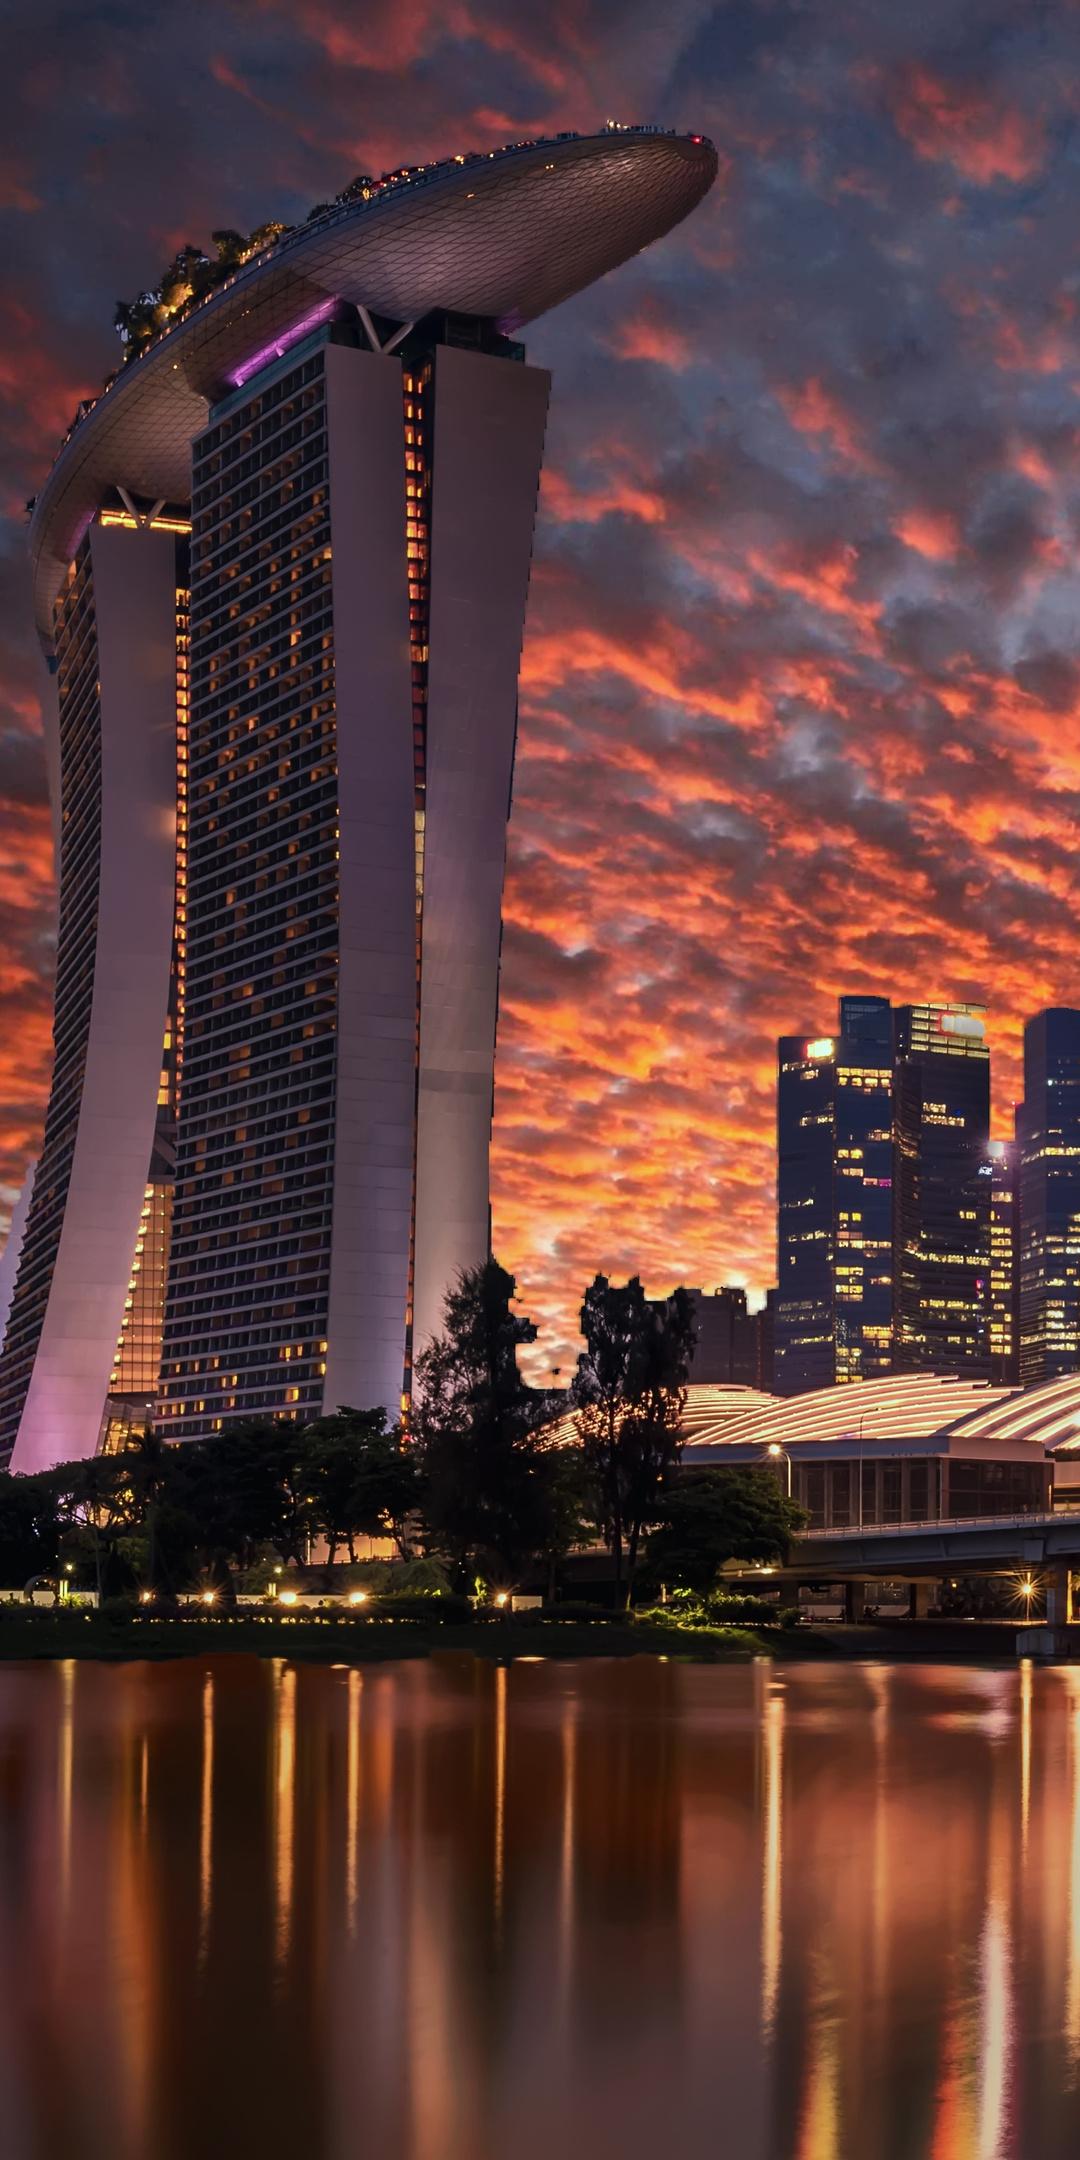 singapore-skyscrapers-marina-bay-sands-evening-4k-es.jpg